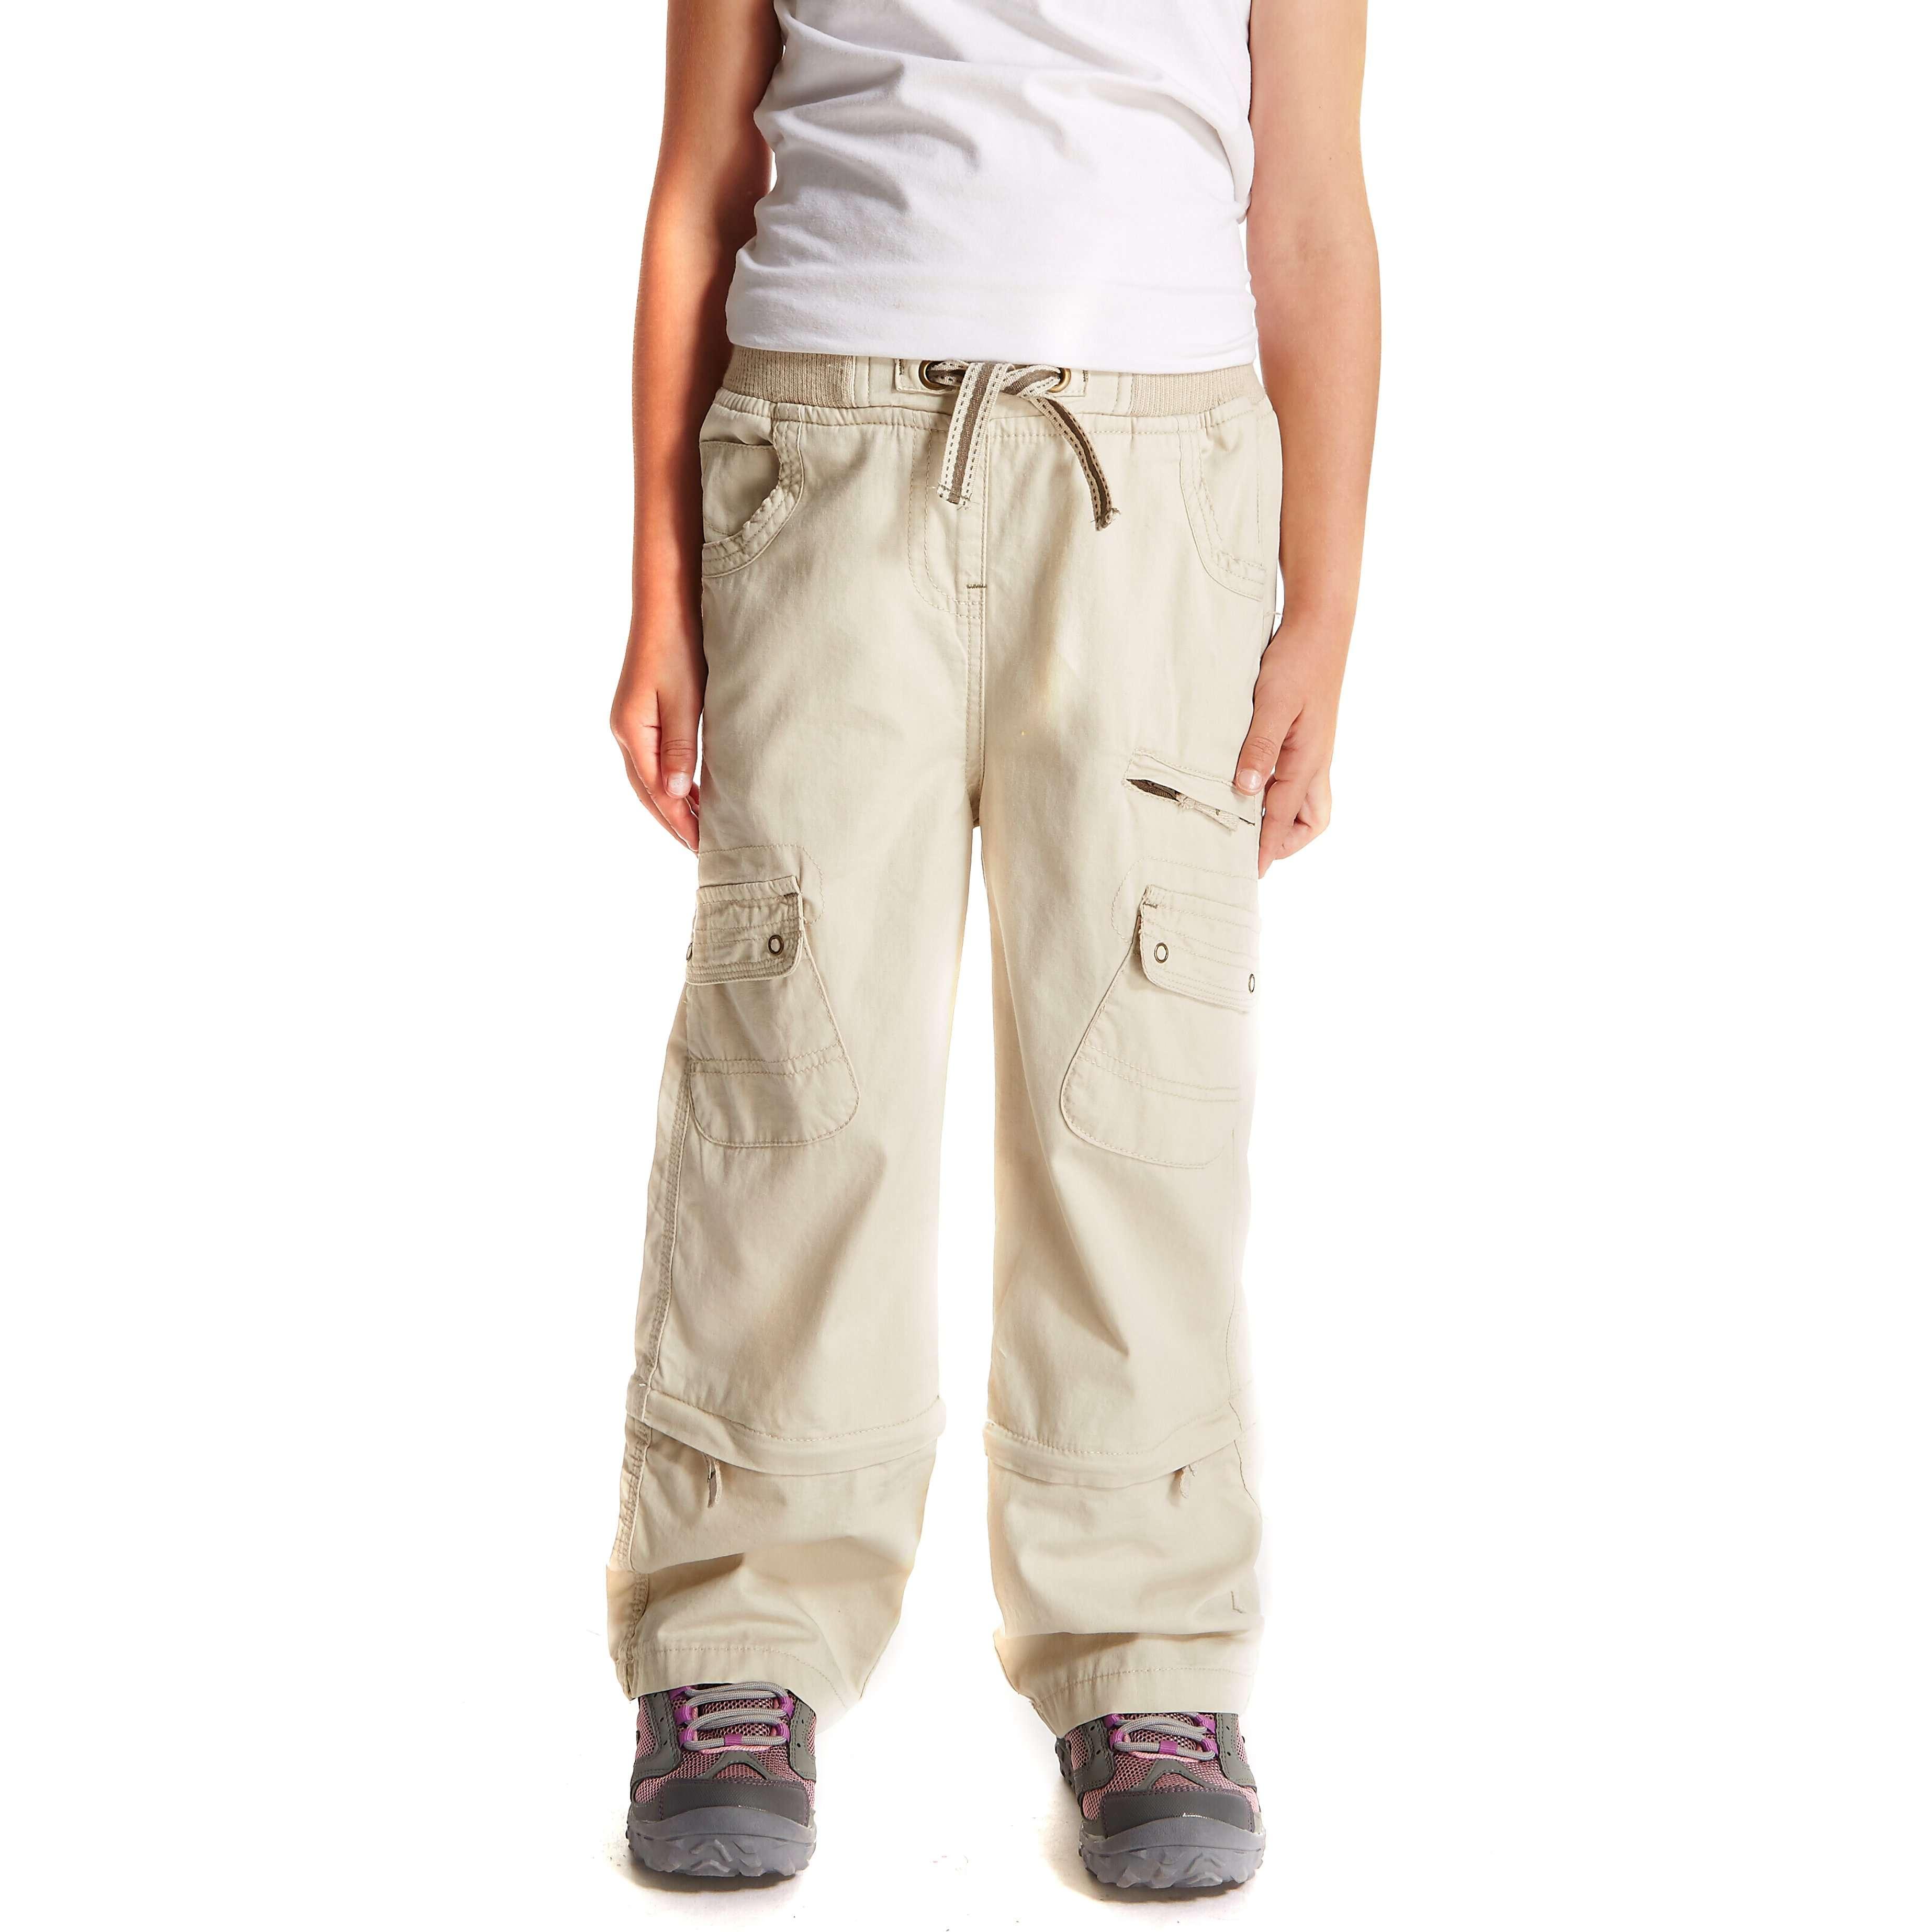 PETER STORM Girl's Zip Off Trousers